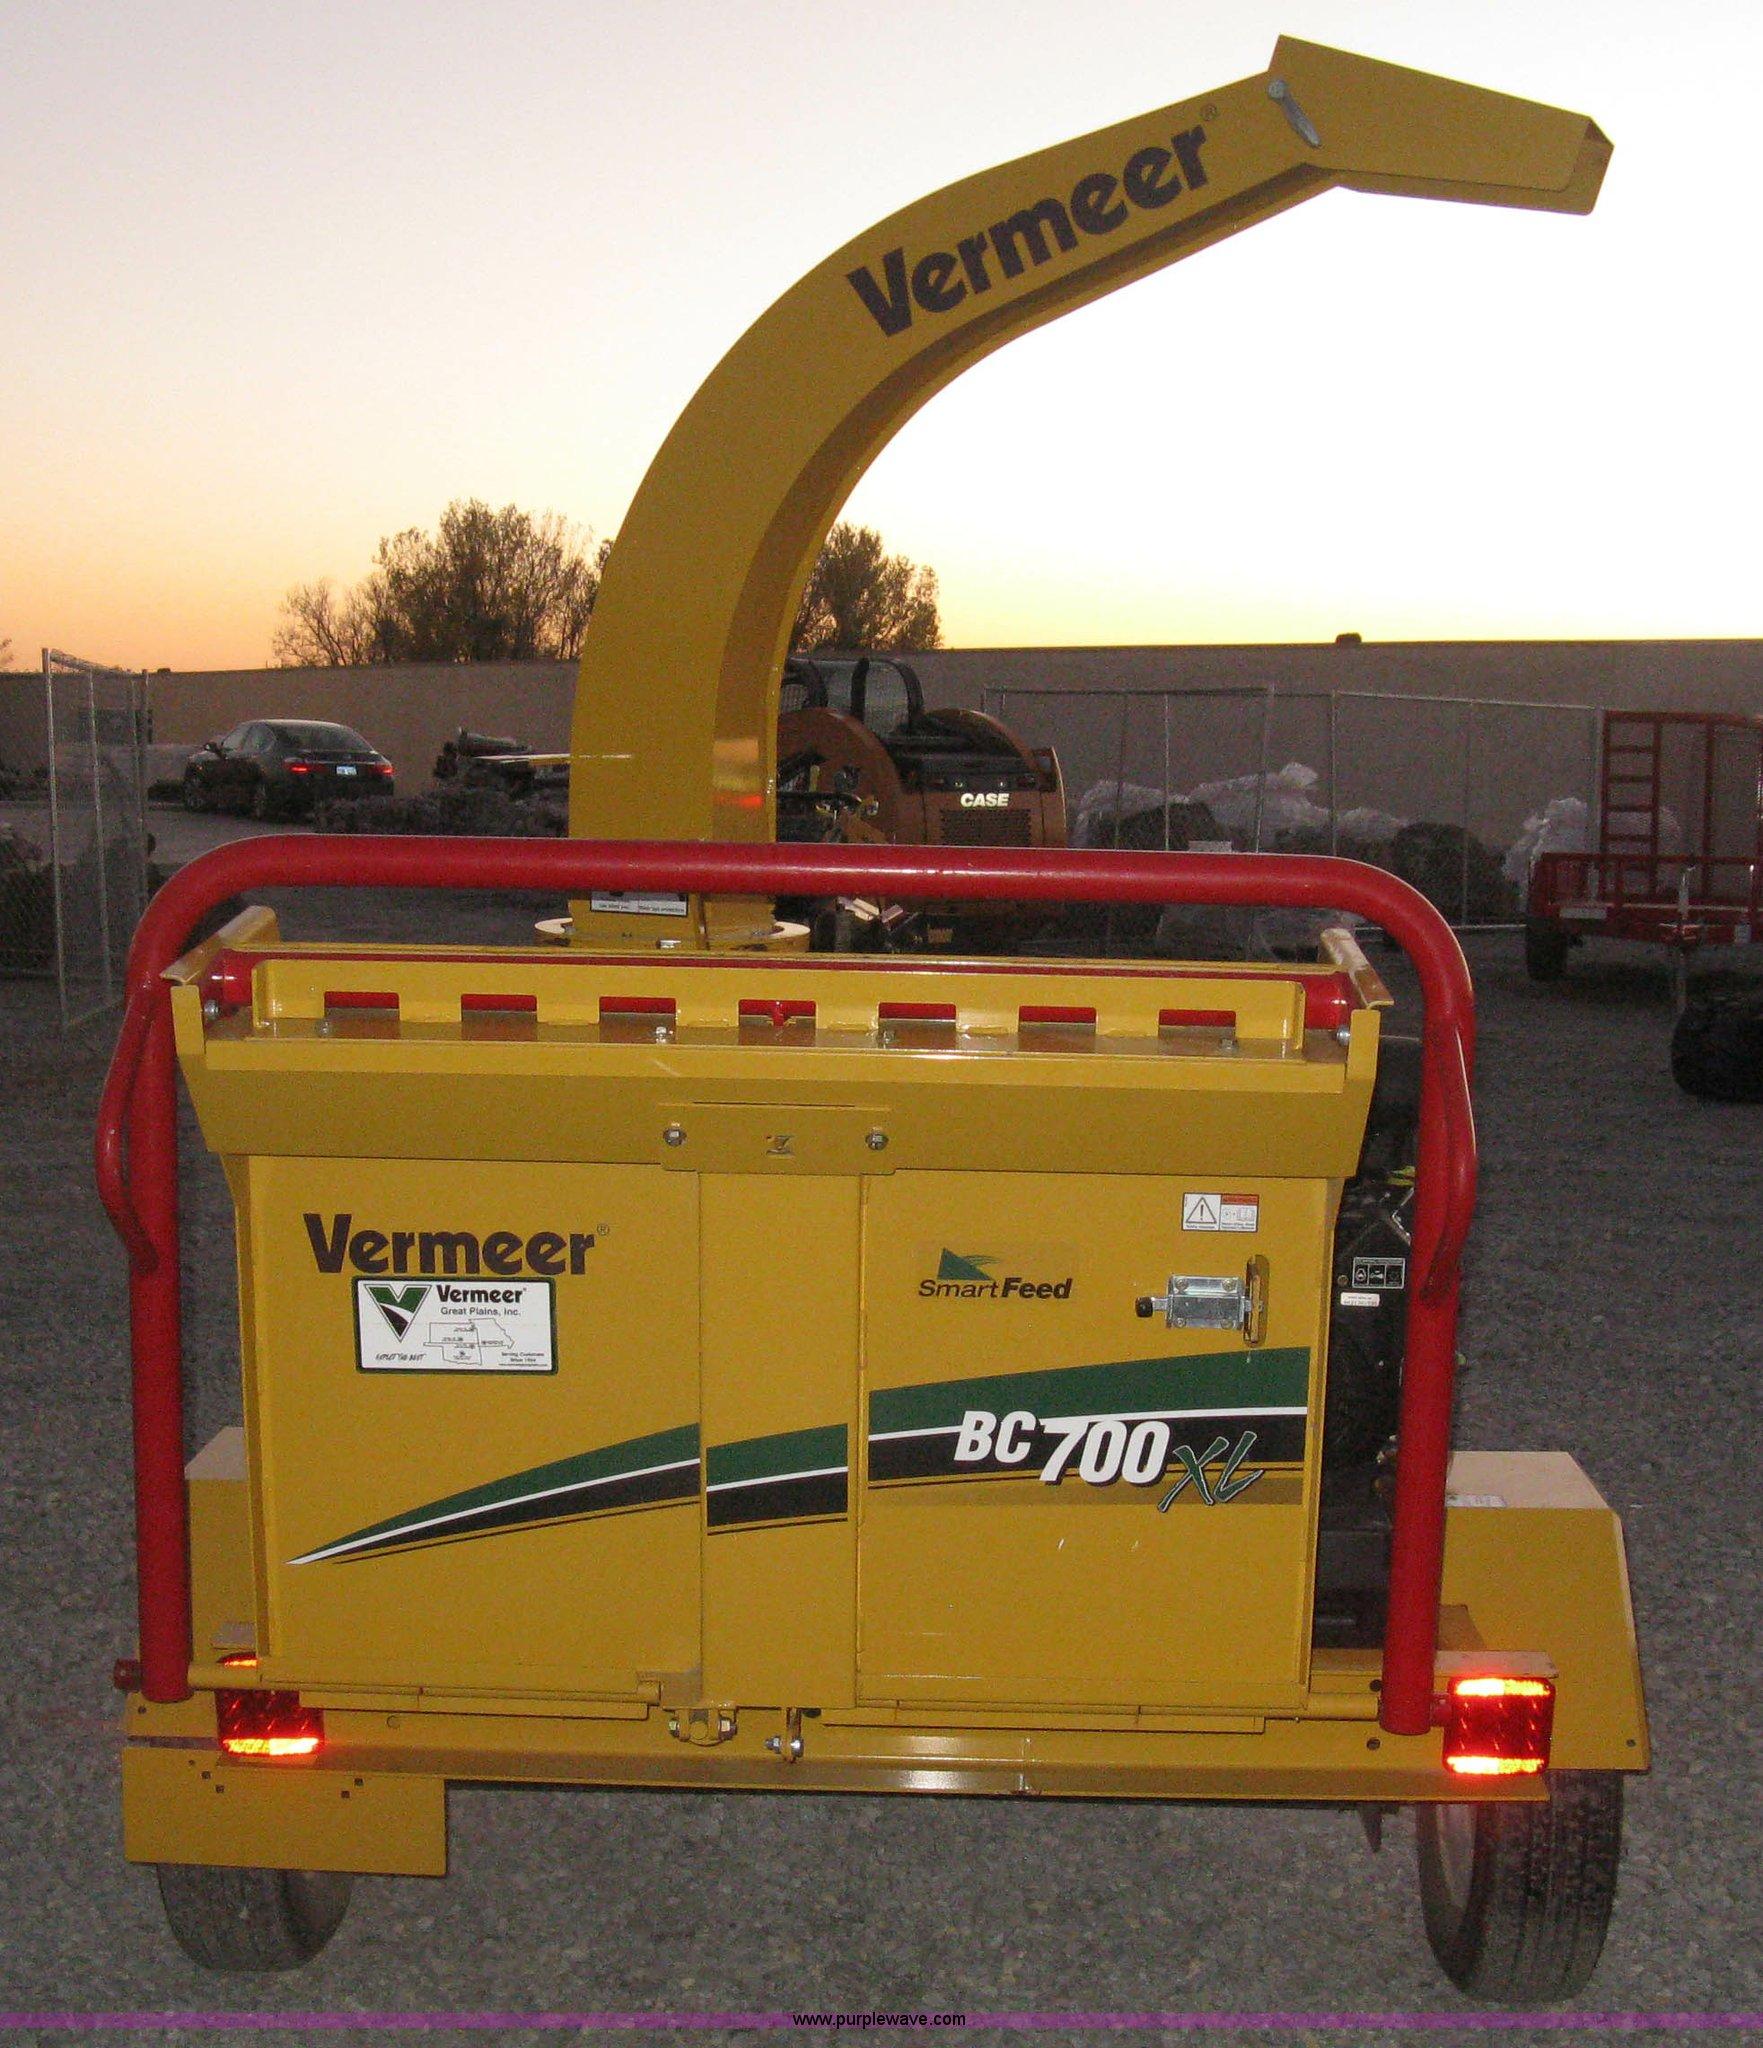 2014 Vermeer BC700XL chipper | Item L6448 | SOLD! December 3